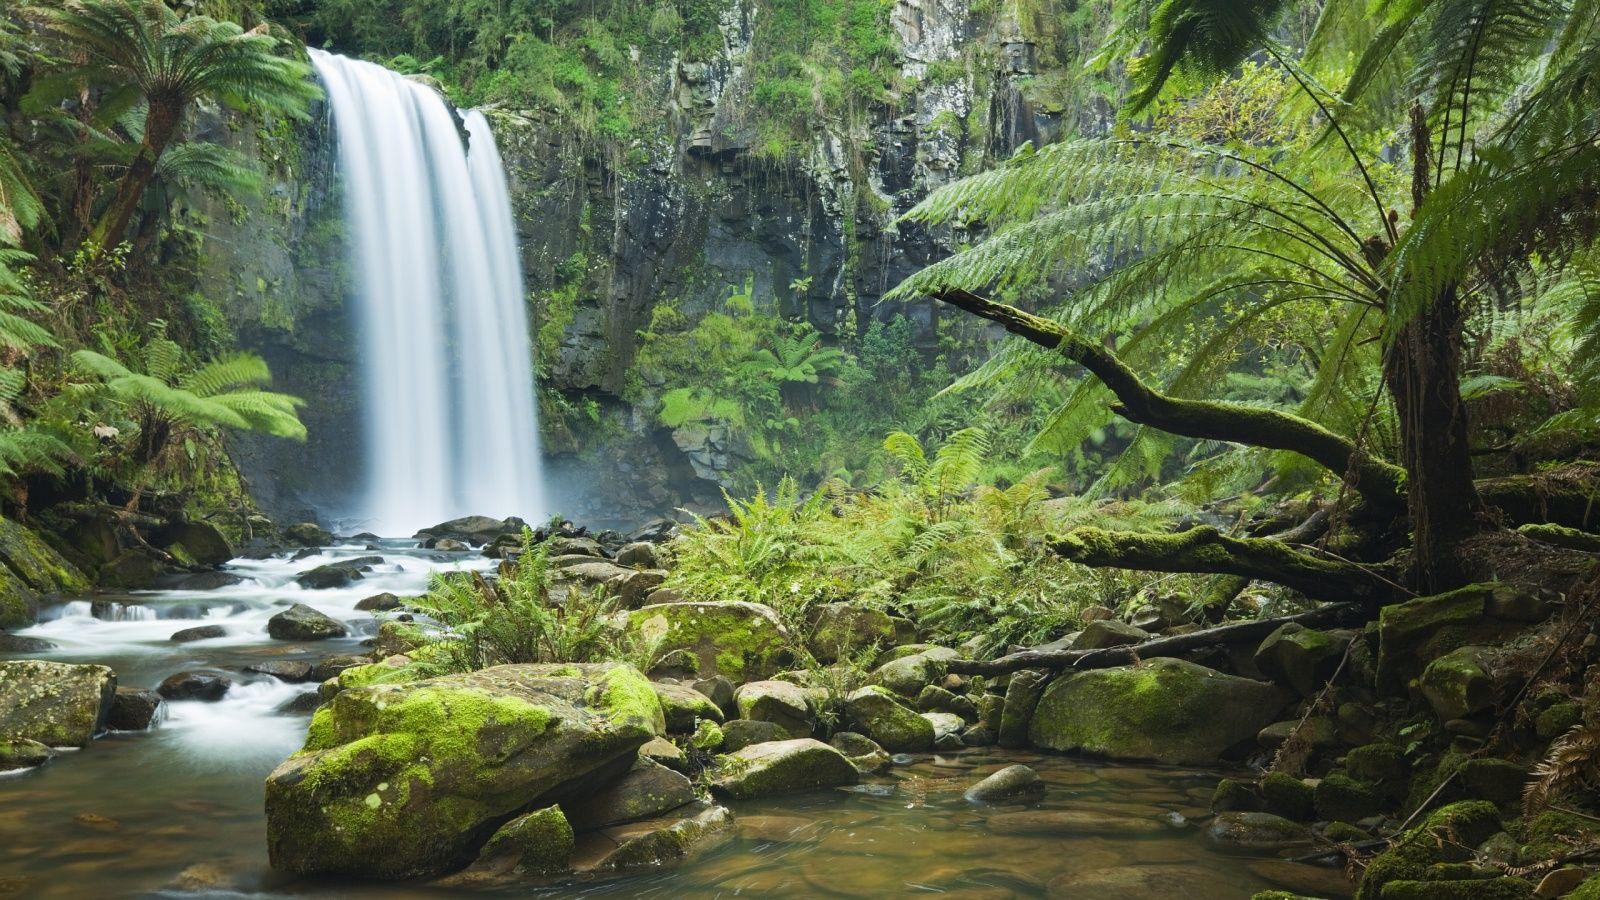 Pin by Denis Dilbaryan on World | Pinterest | Search, Rainforests ...